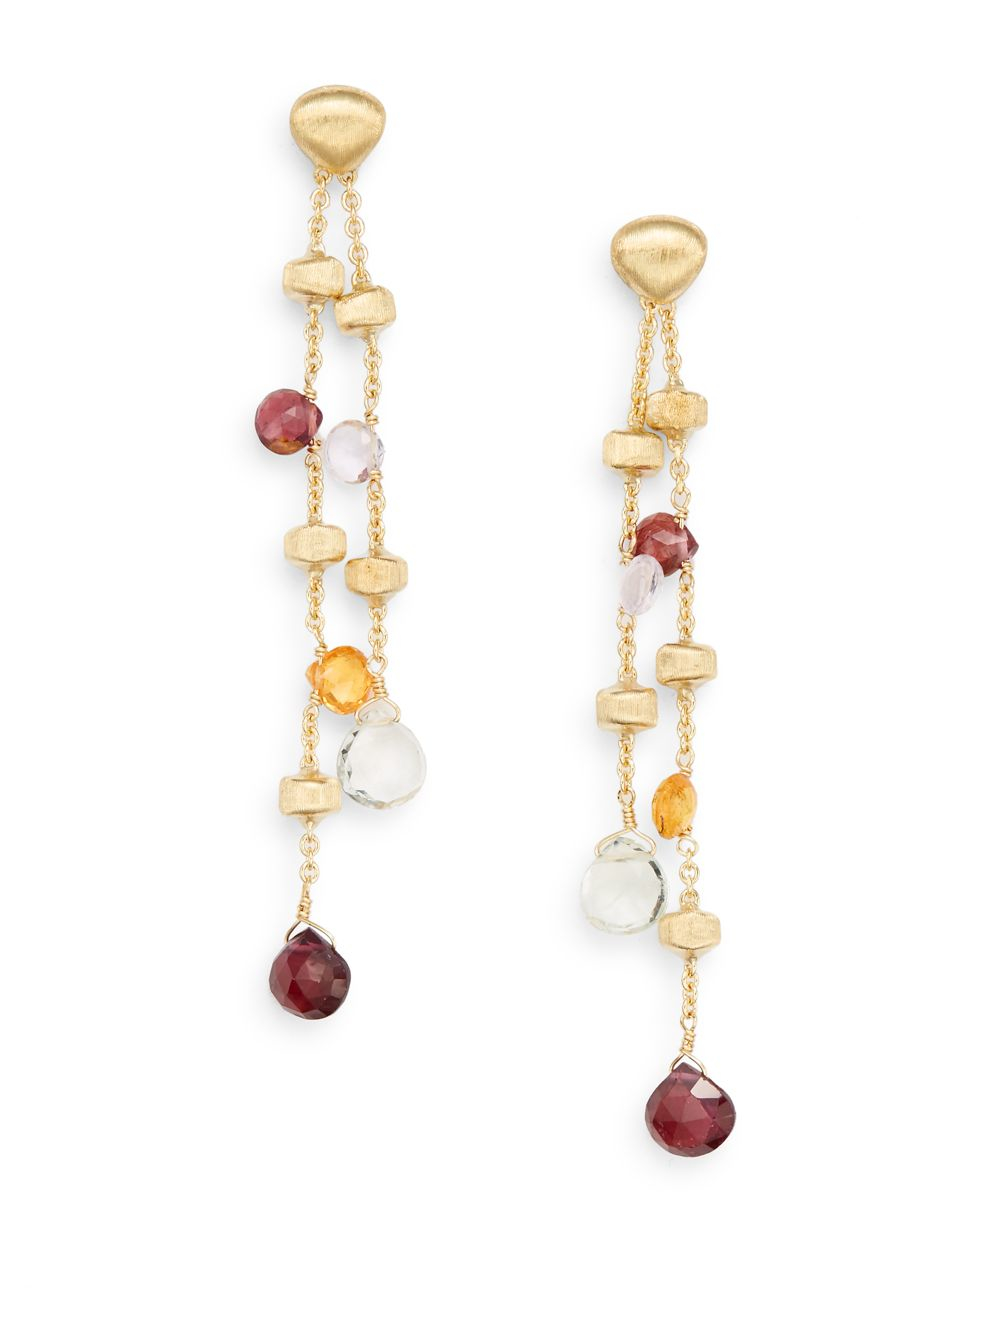 Marco Bicego Paradise Long Mixed-Stone Drop Earrings exI6OcCipq